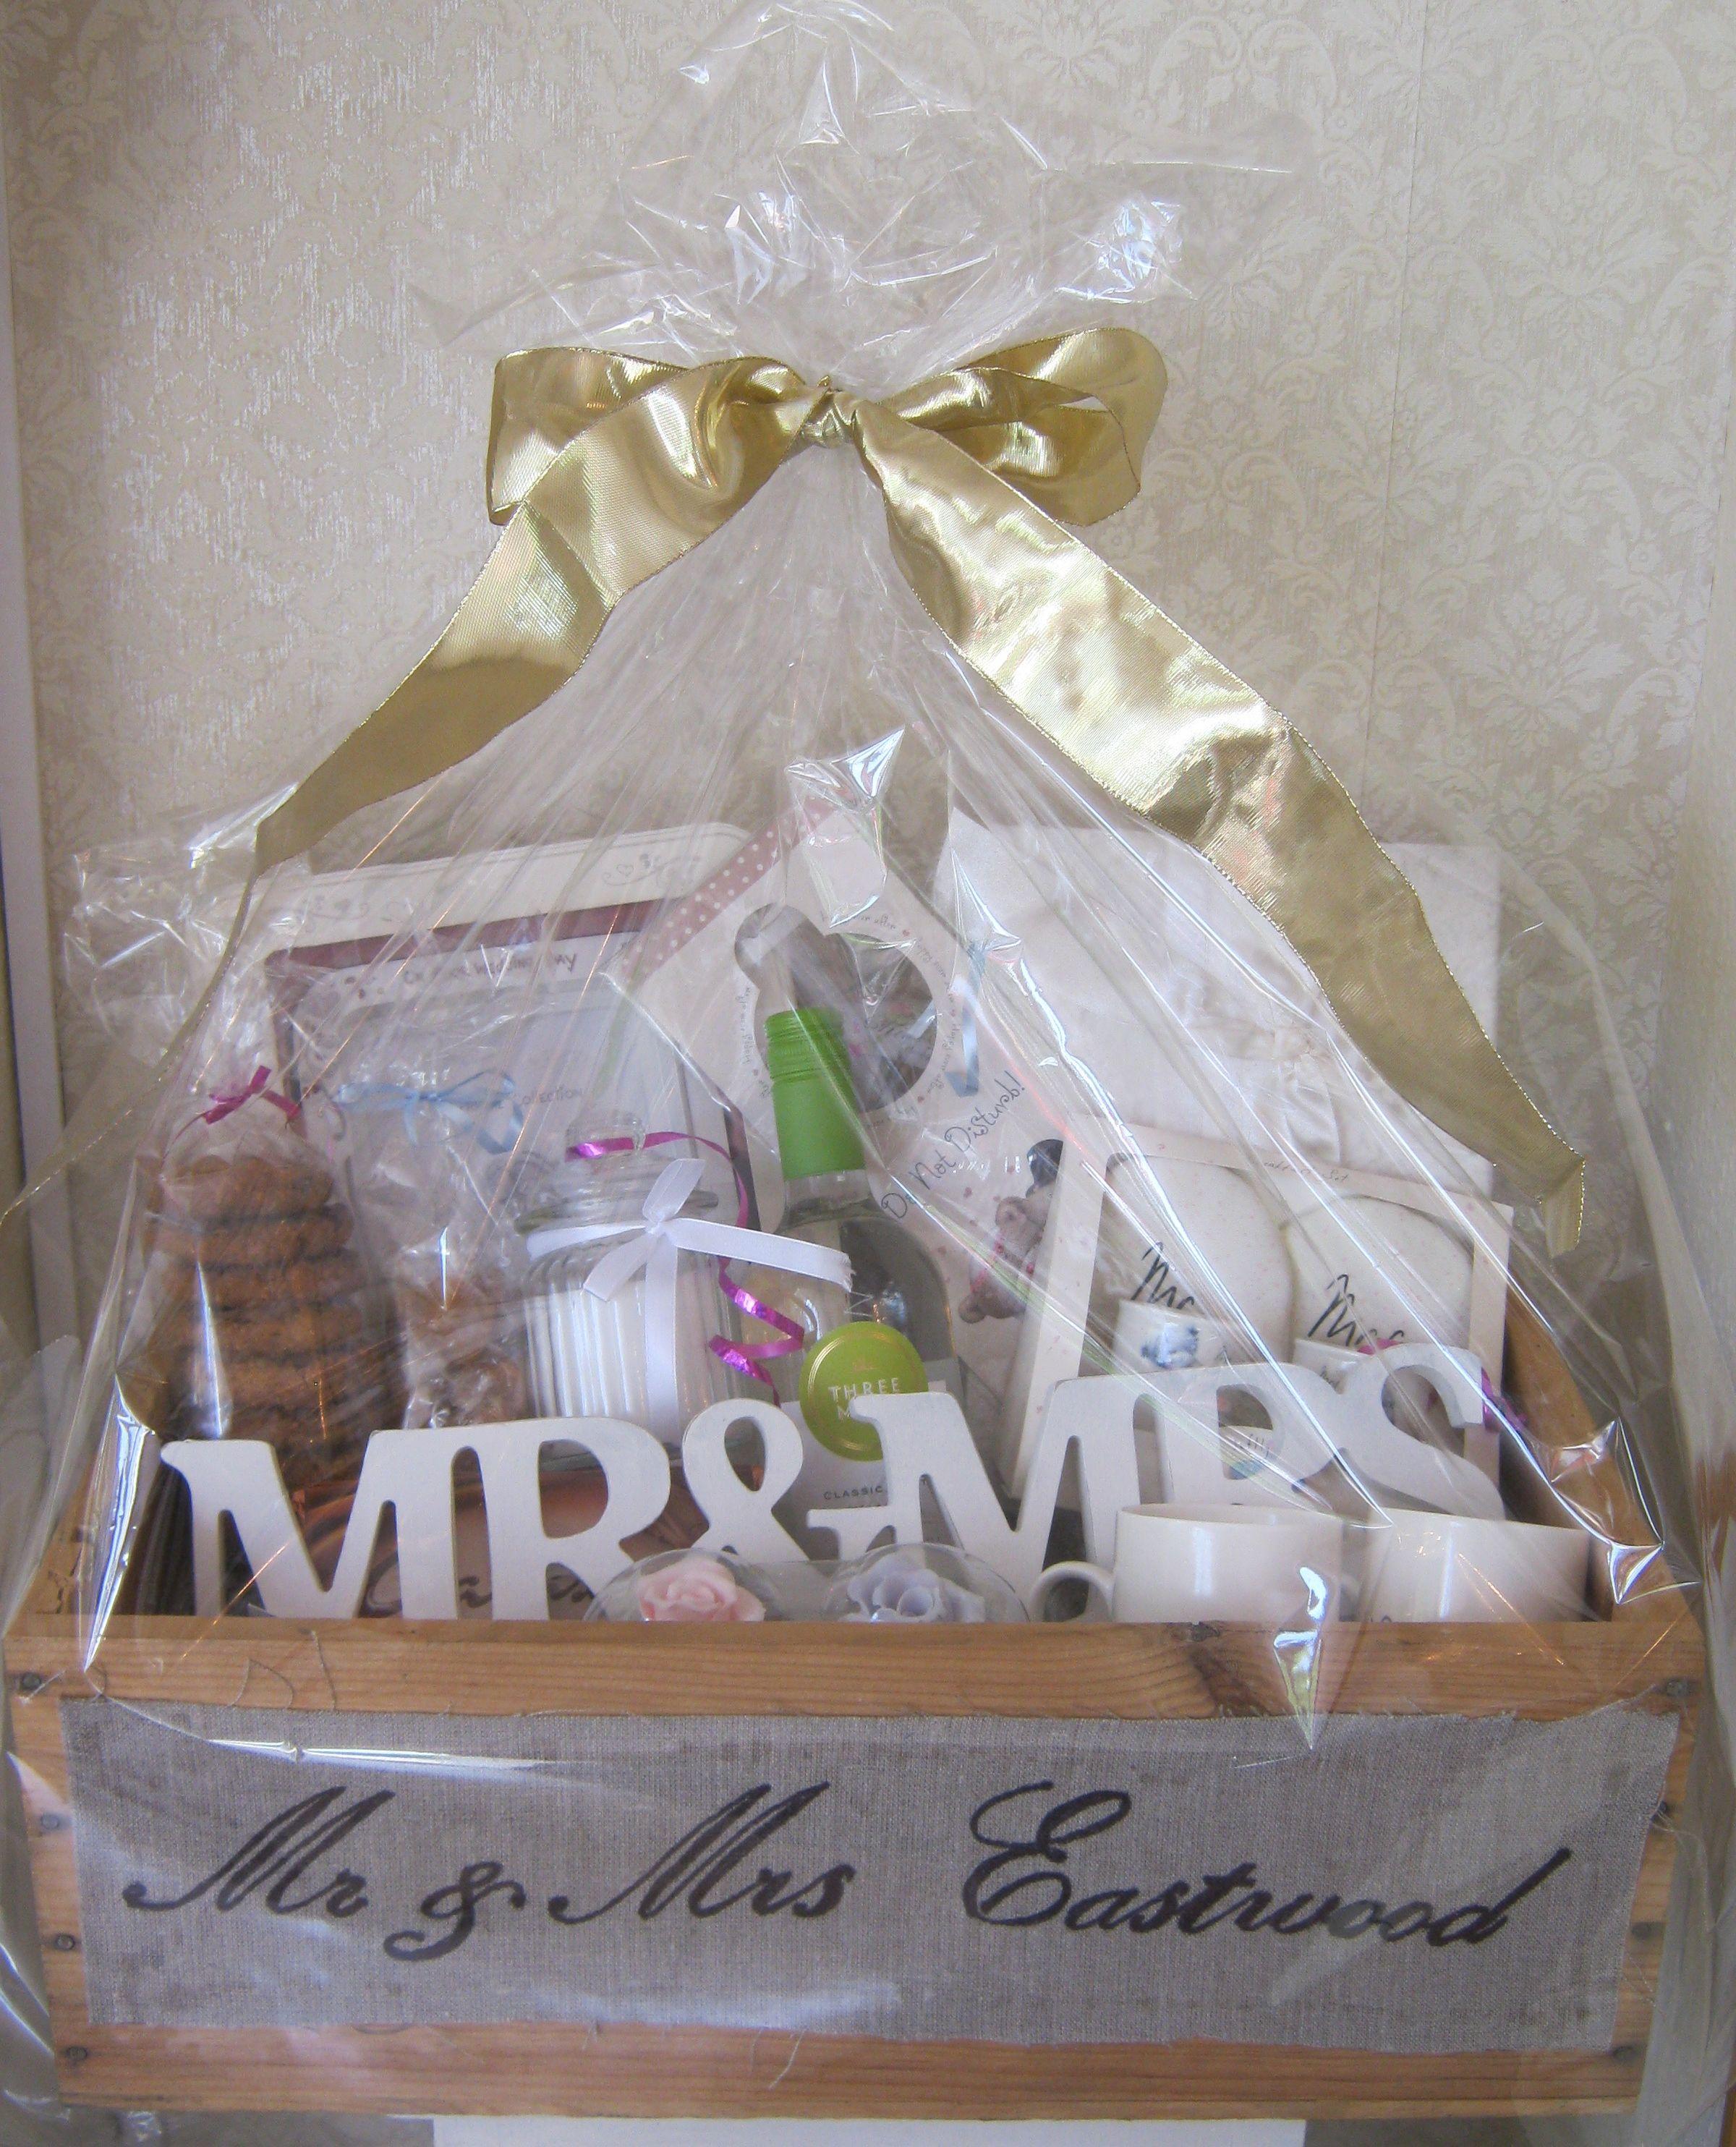 Wedding Night Gift For Bride: Wedding Hamper Www.chic-dreams.co.uk